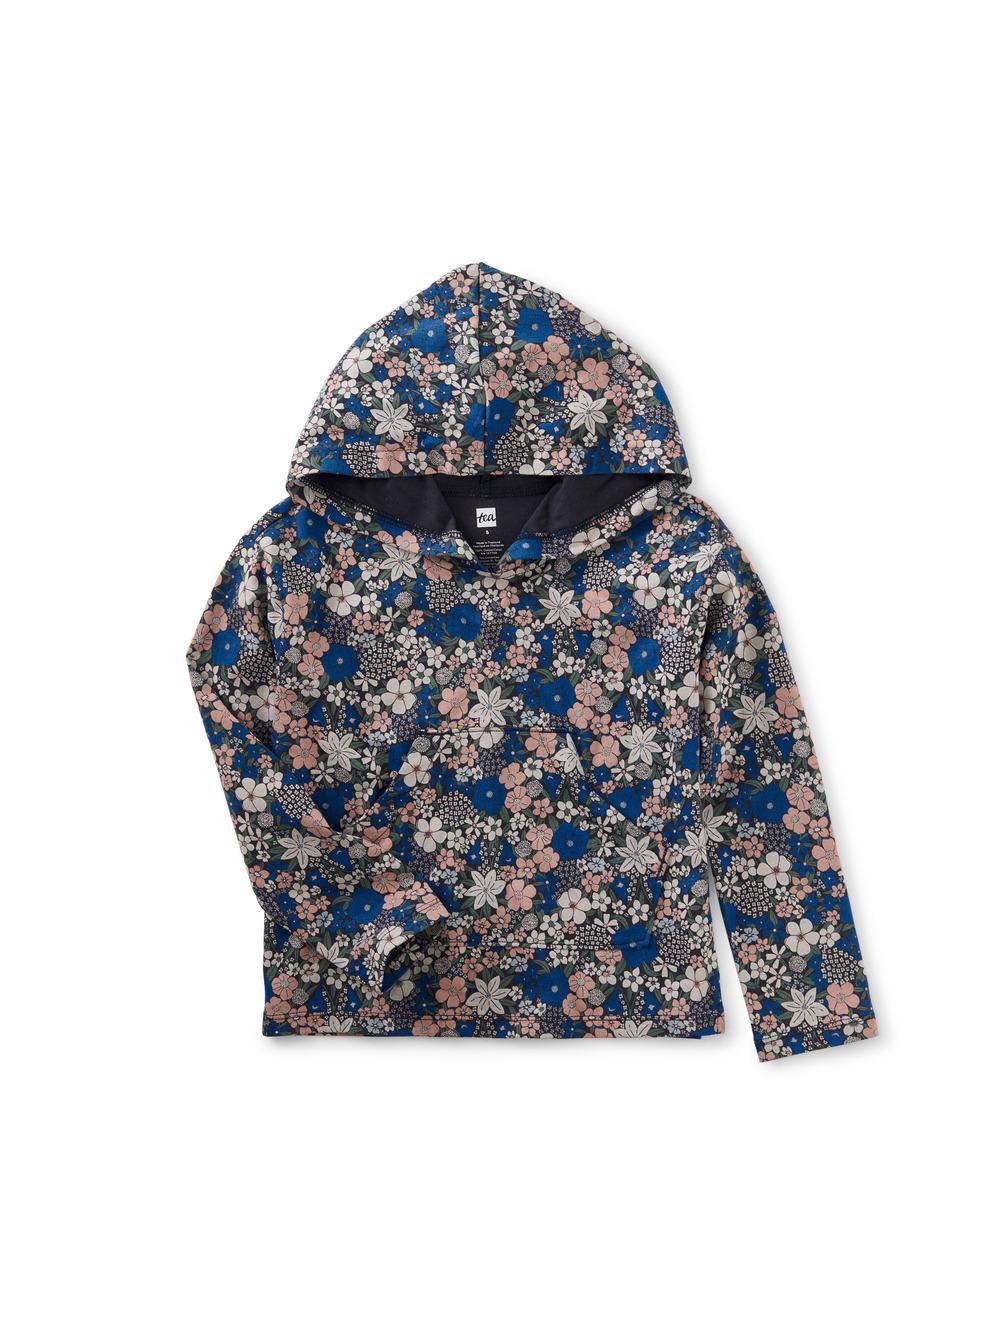 Front Pocket Hooded Top